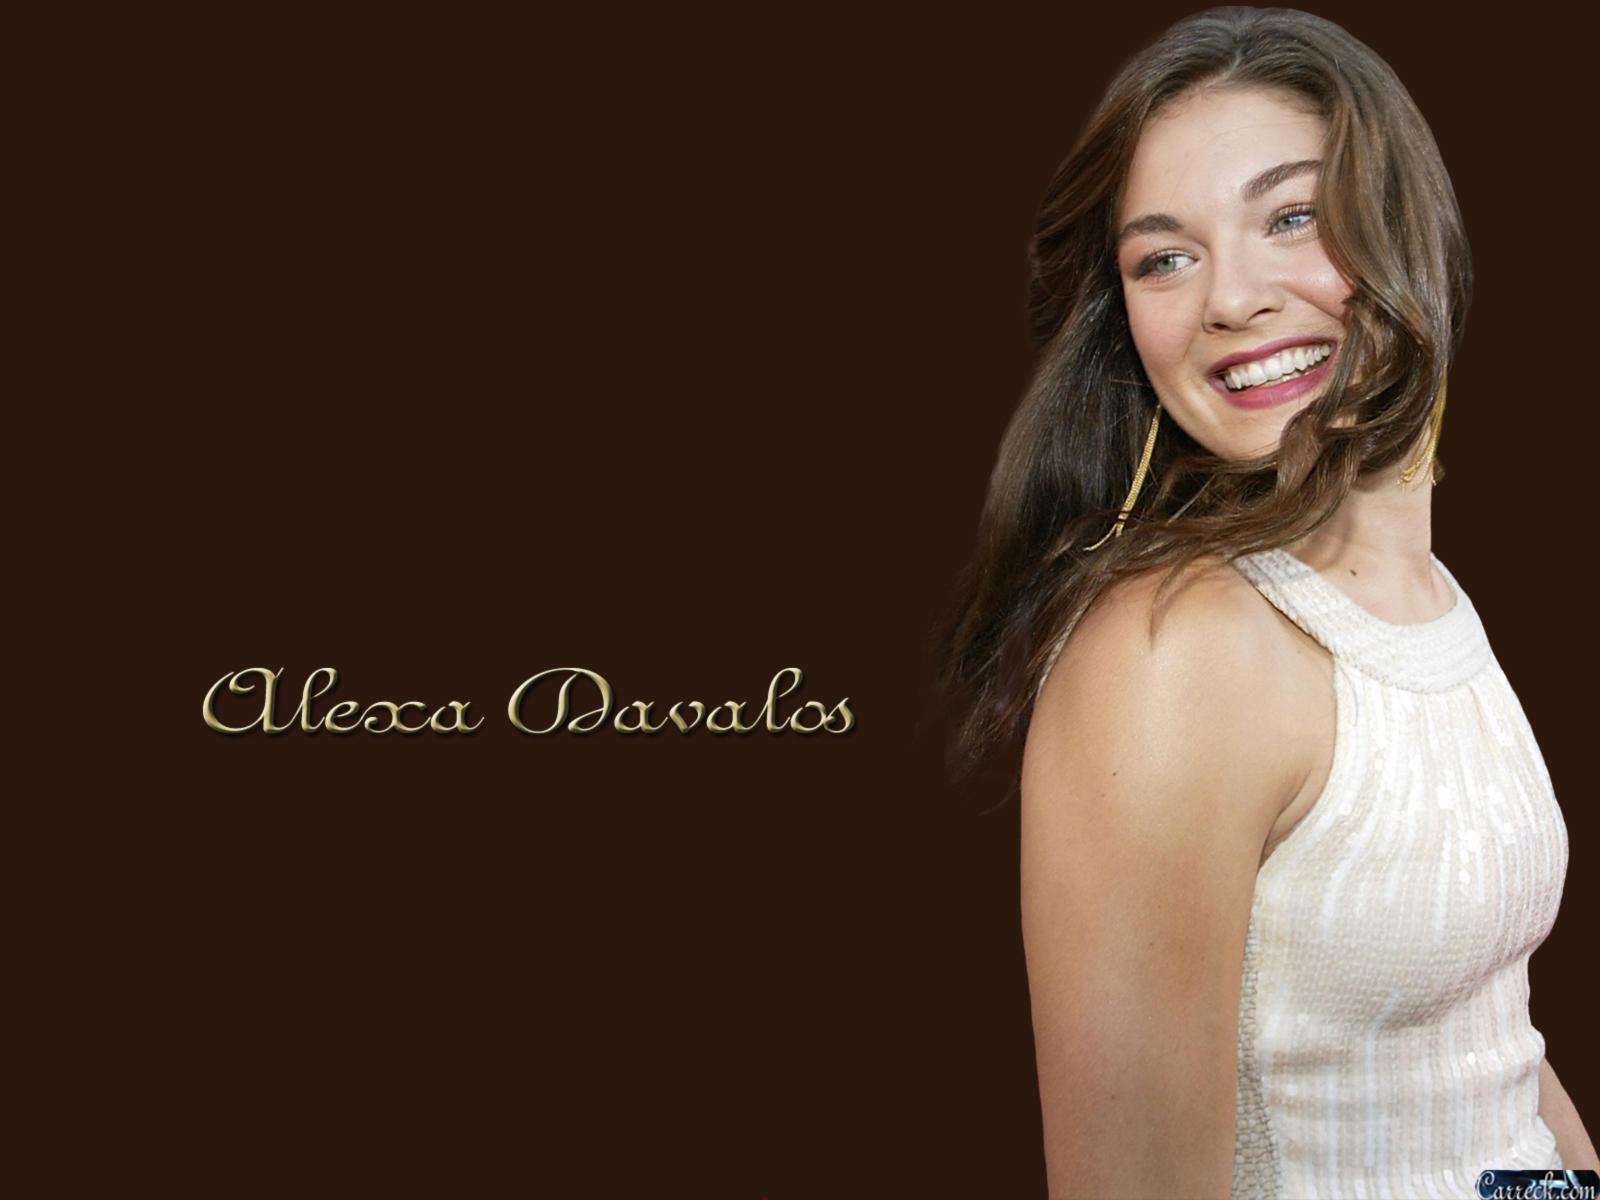 Alexa Davalos